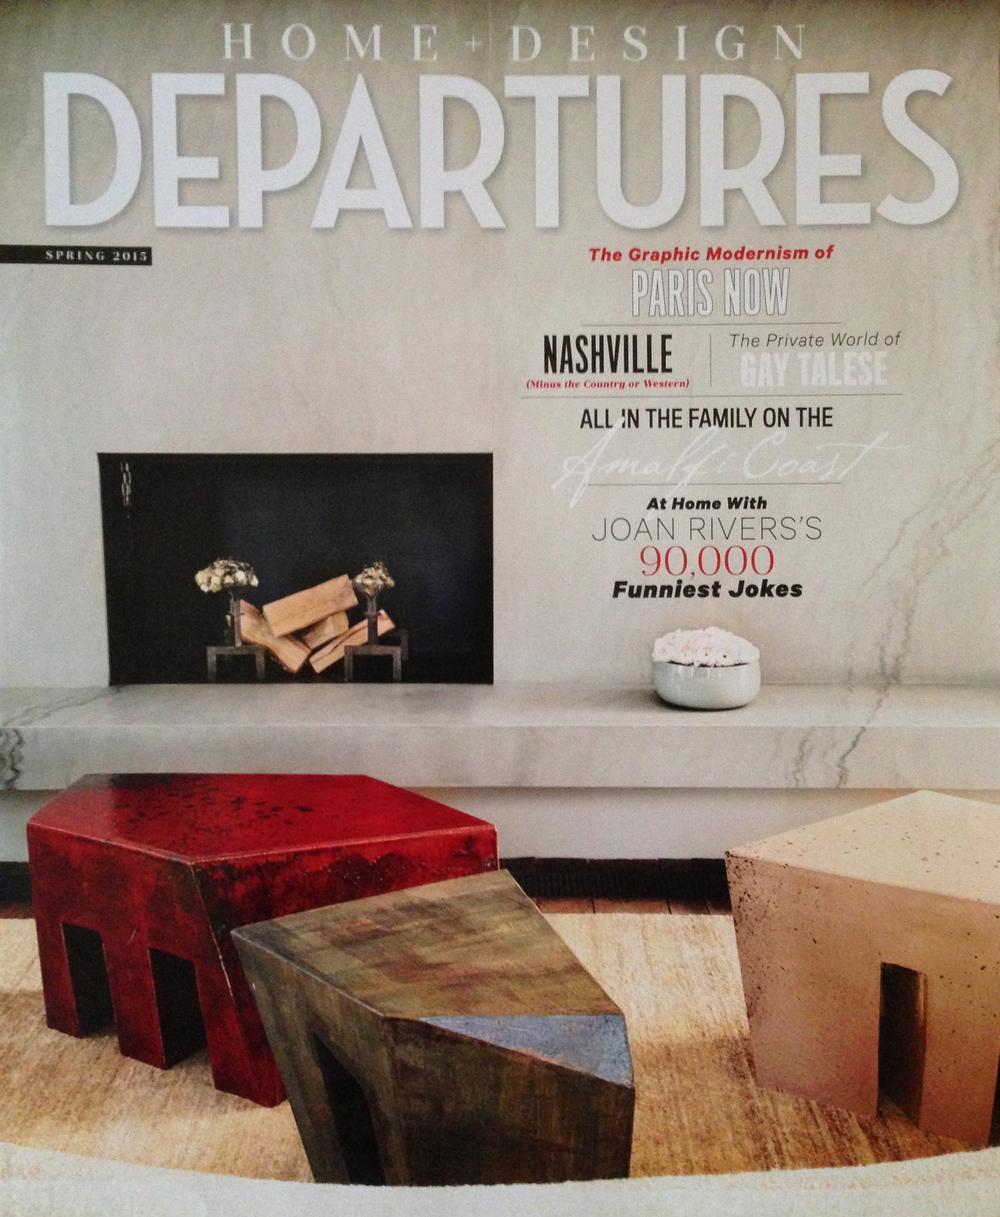 Departures_Spring 2015_cover.jpg